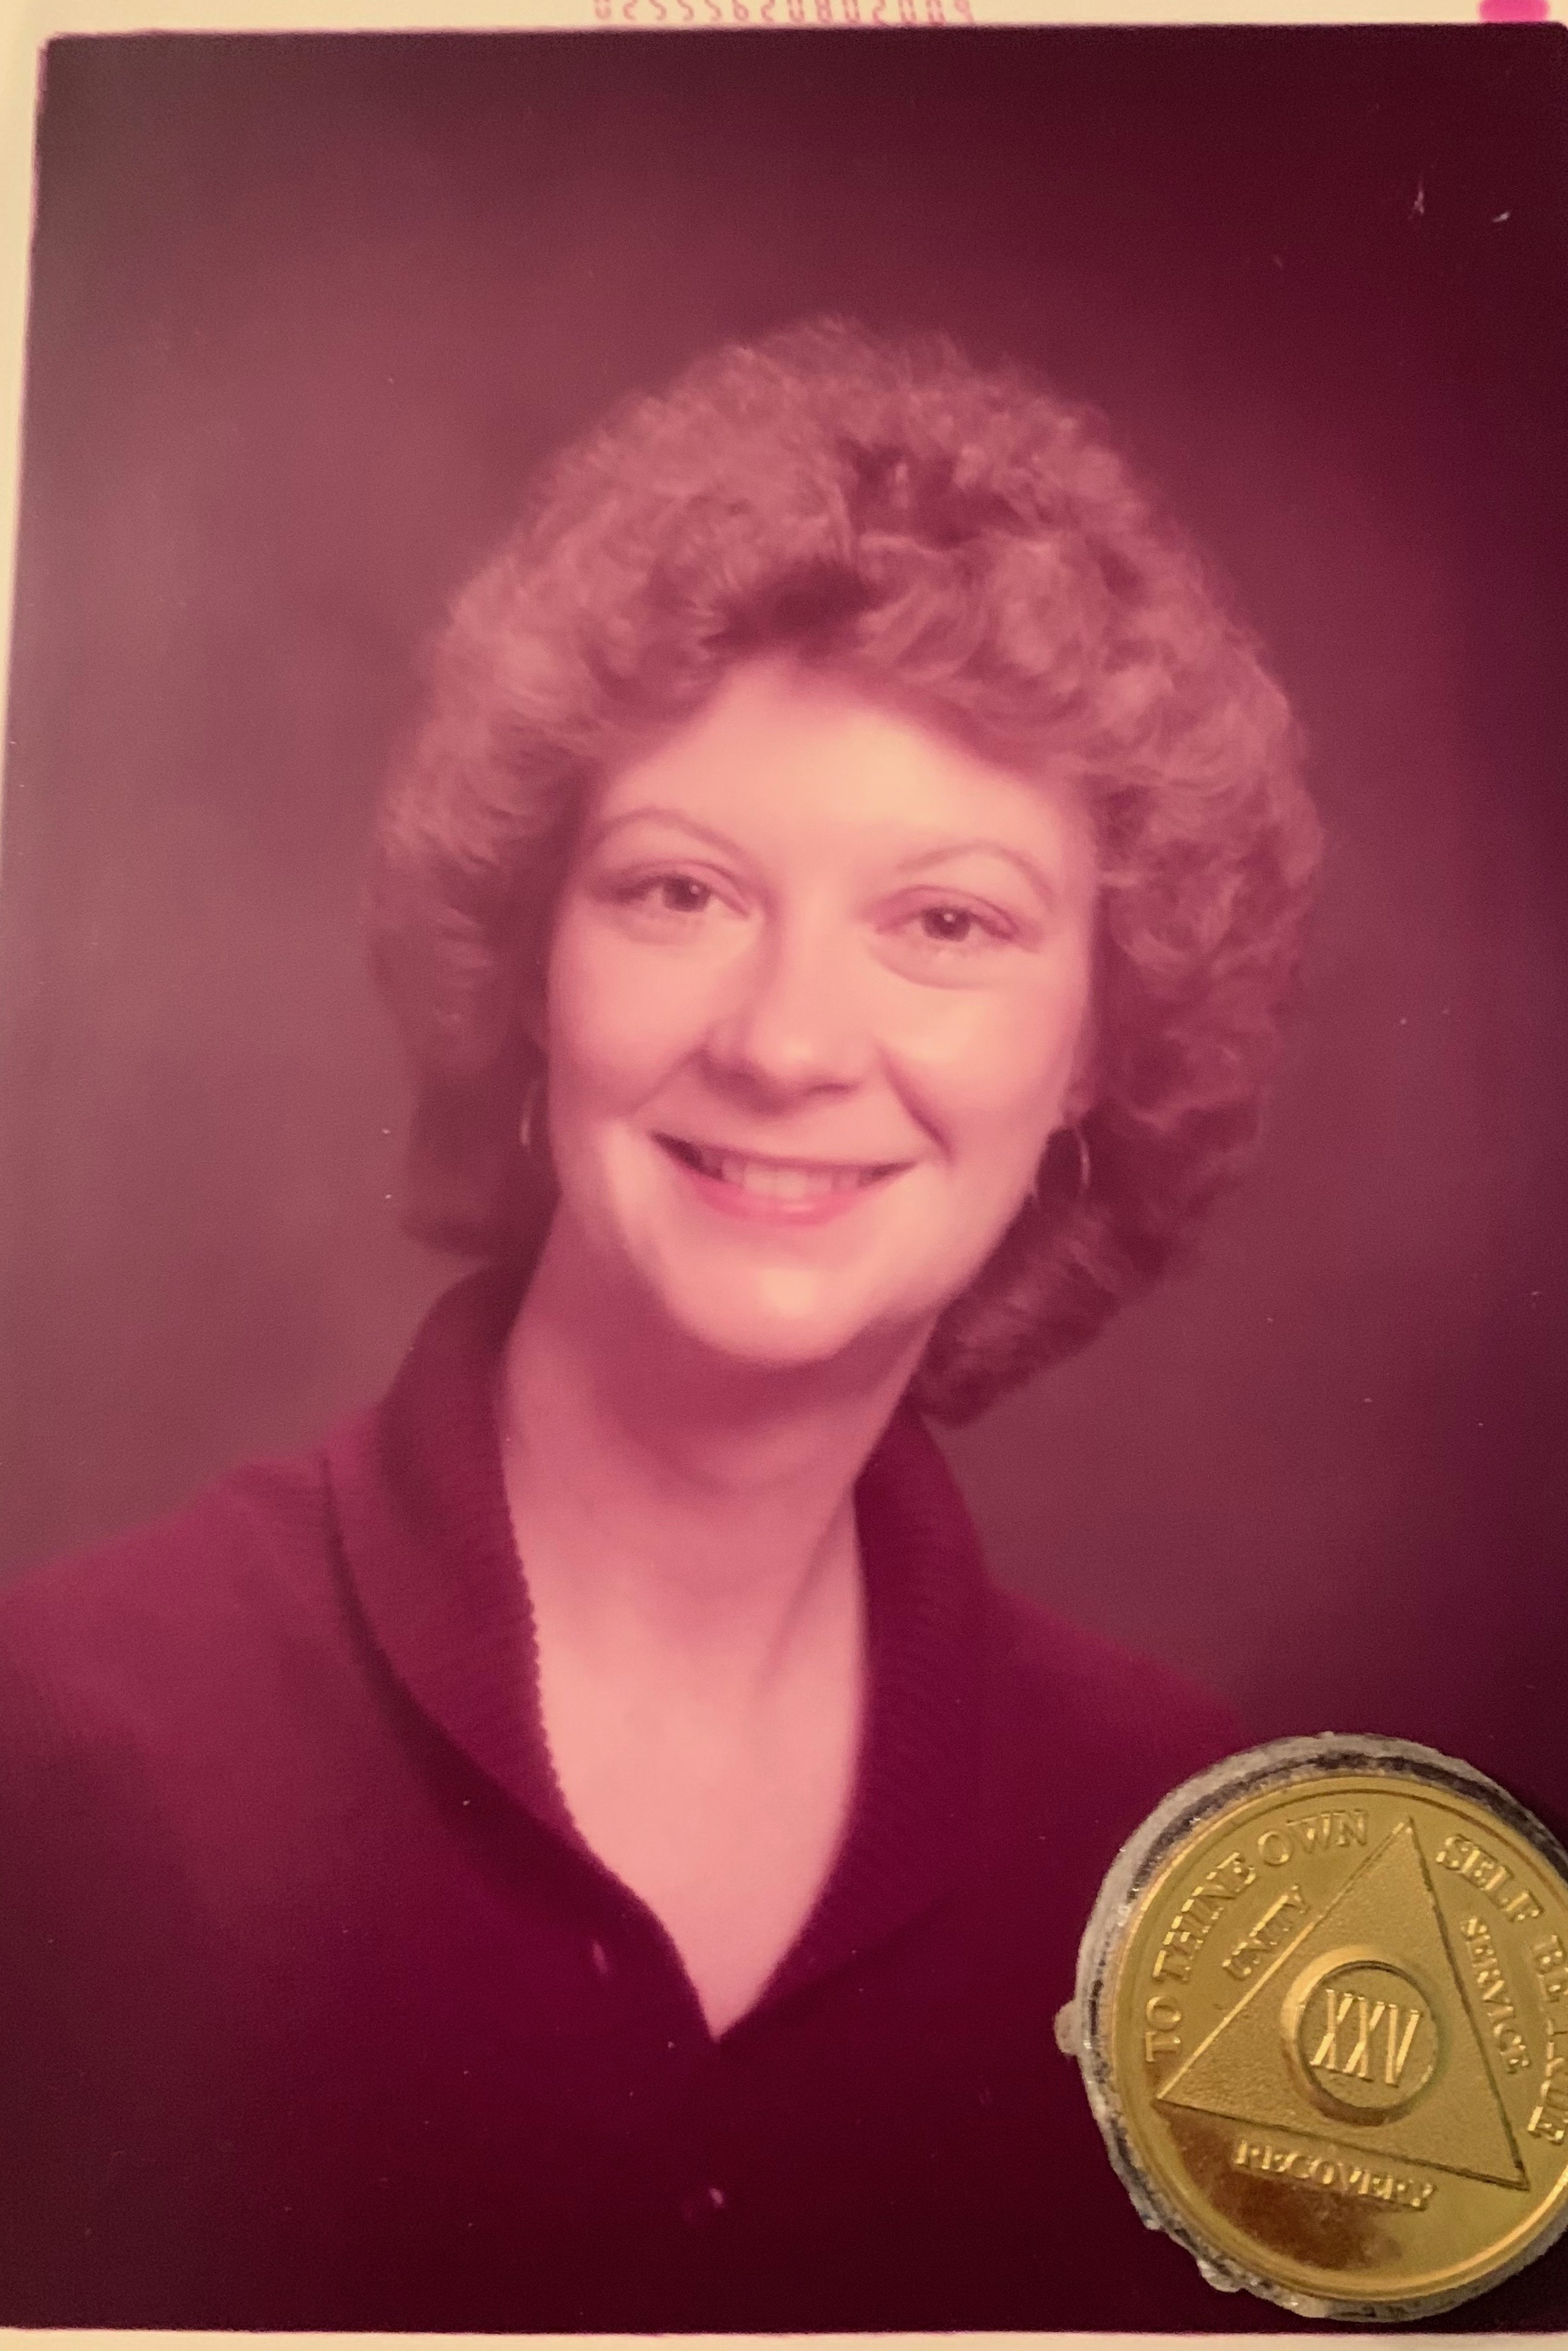 Jo White-Linnemon and her 25 Year Sobriety Chip.